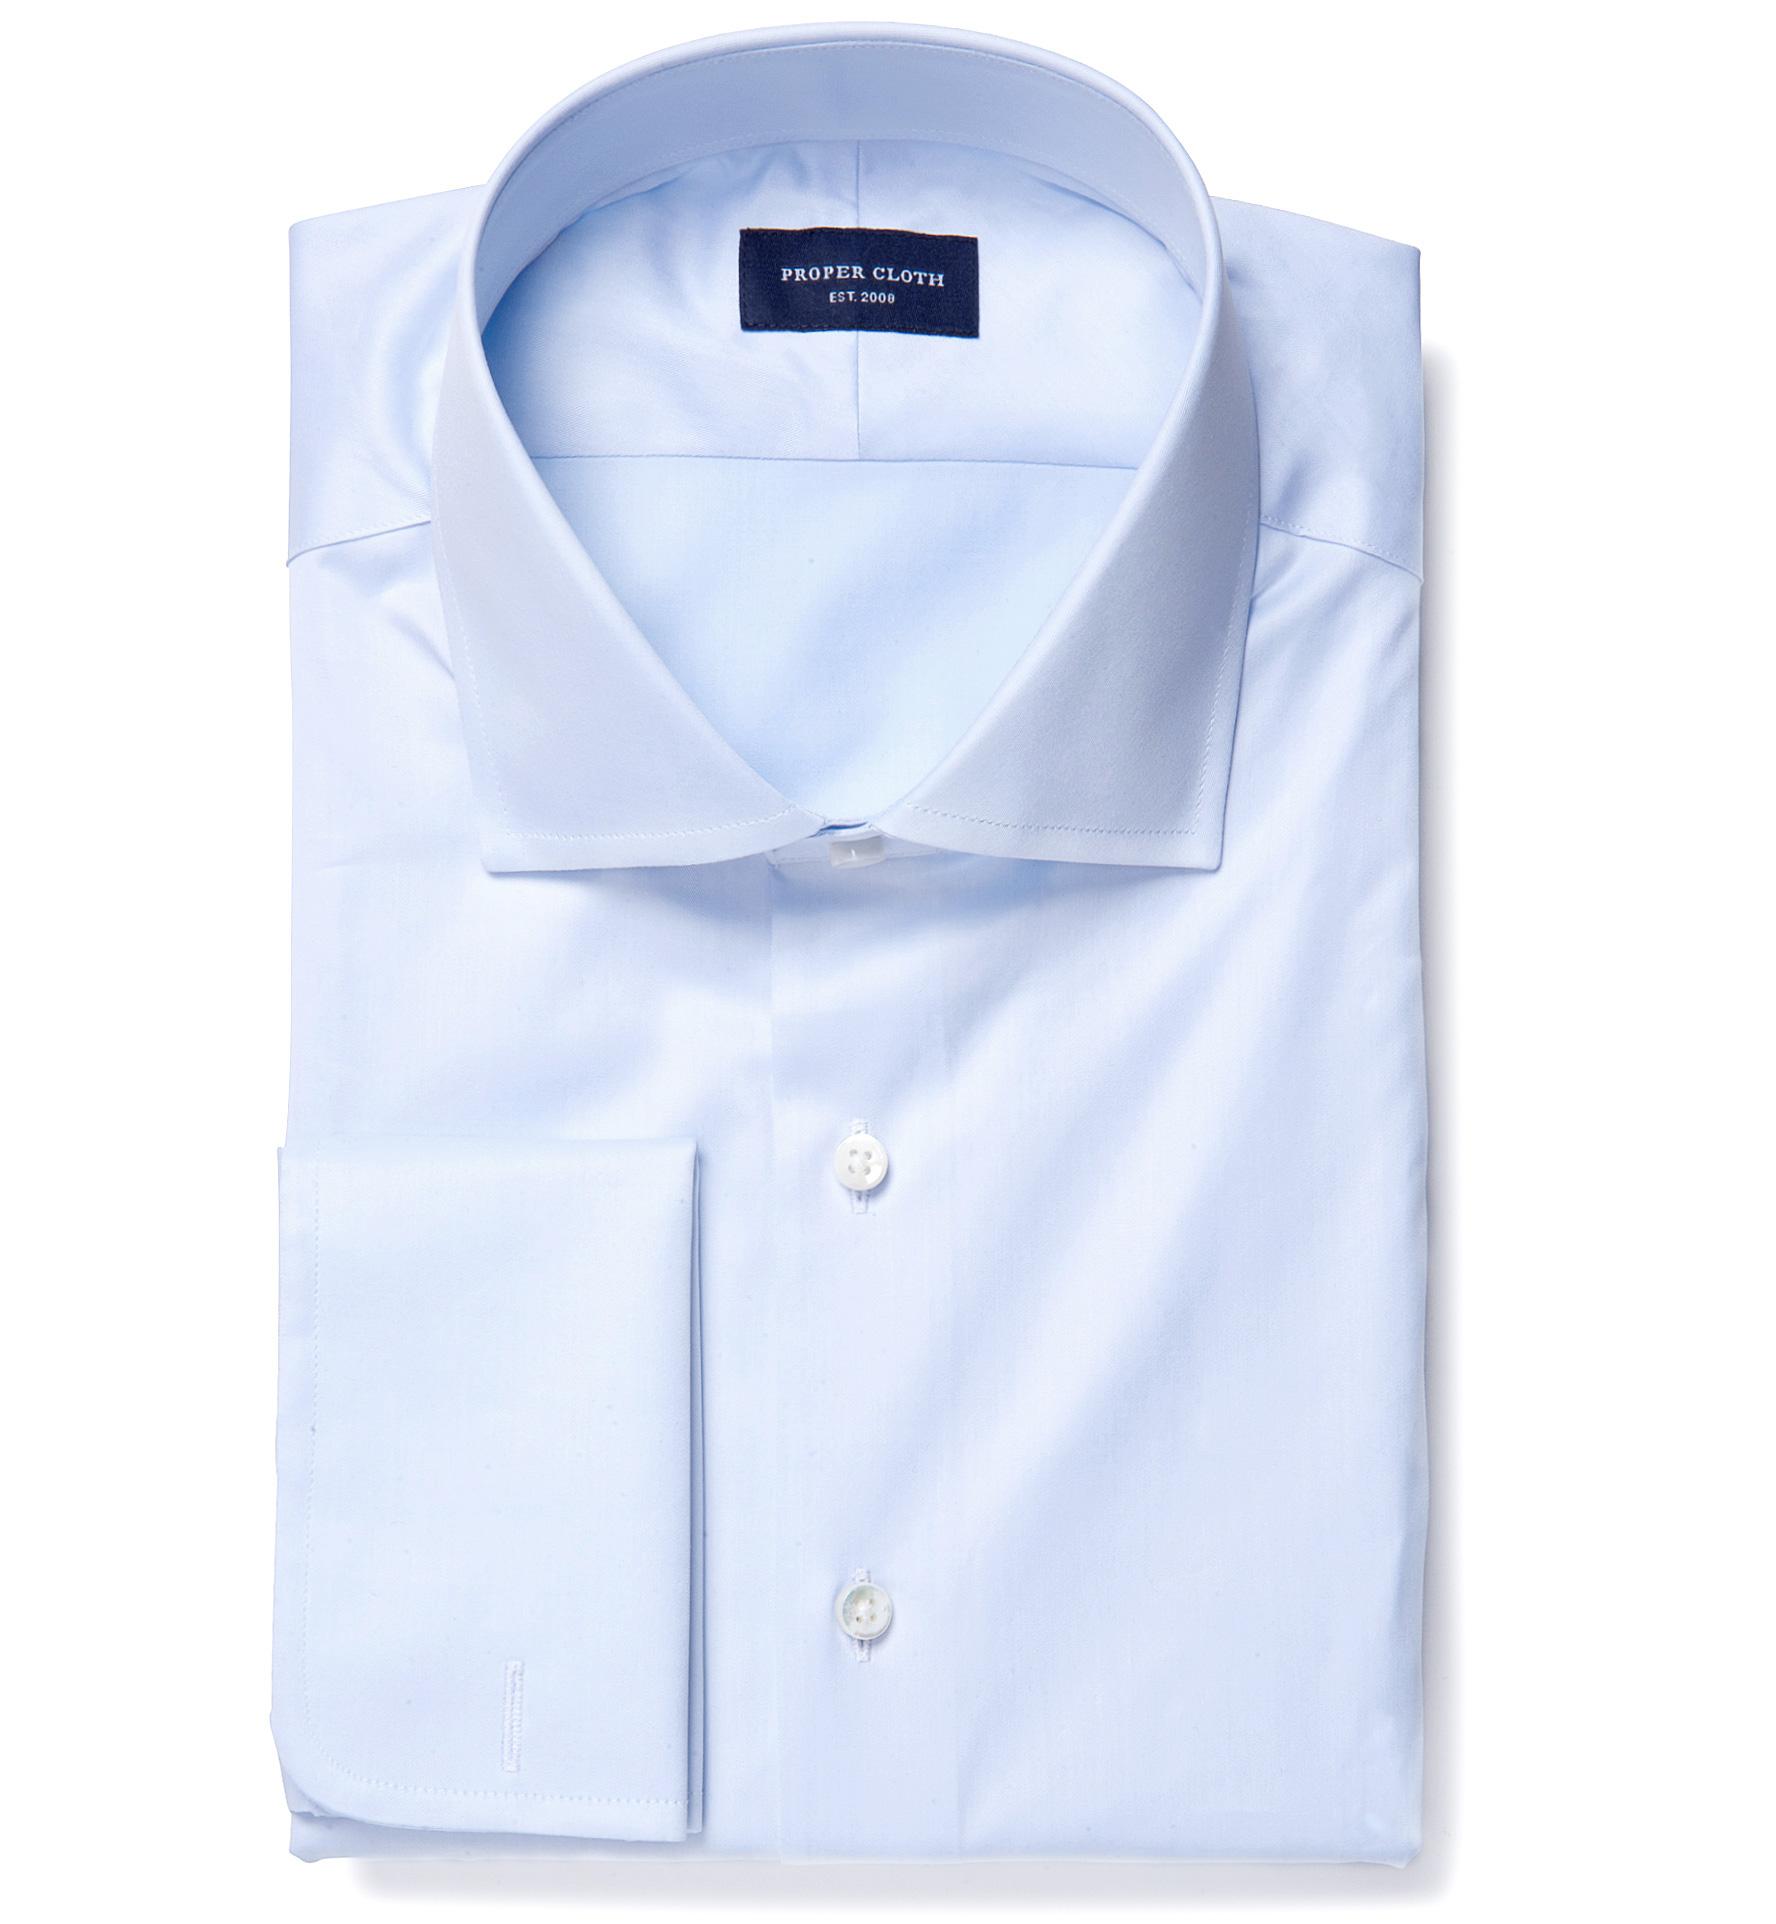 Thomas mason goldline light blue fine twill tailor made for Thomas mason dress shirts